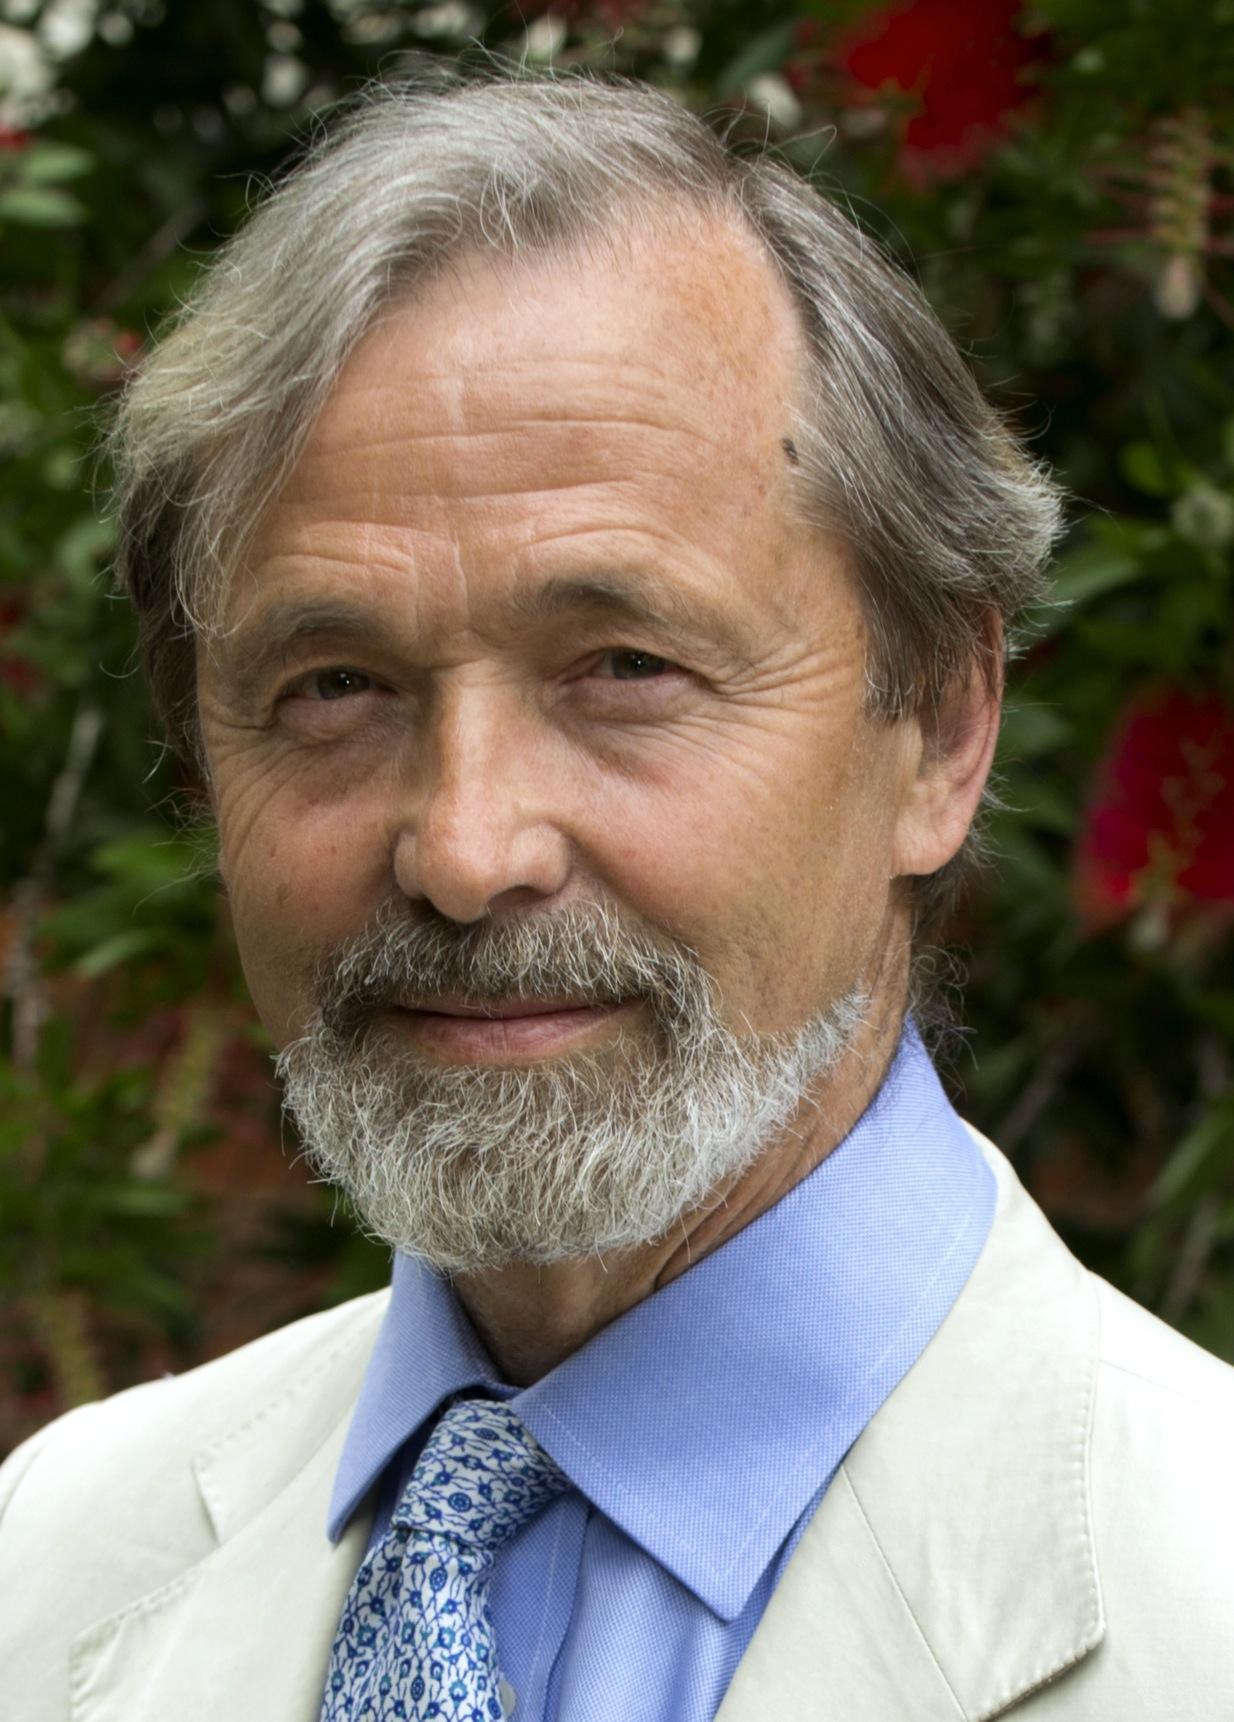 Geoffrey Boulton